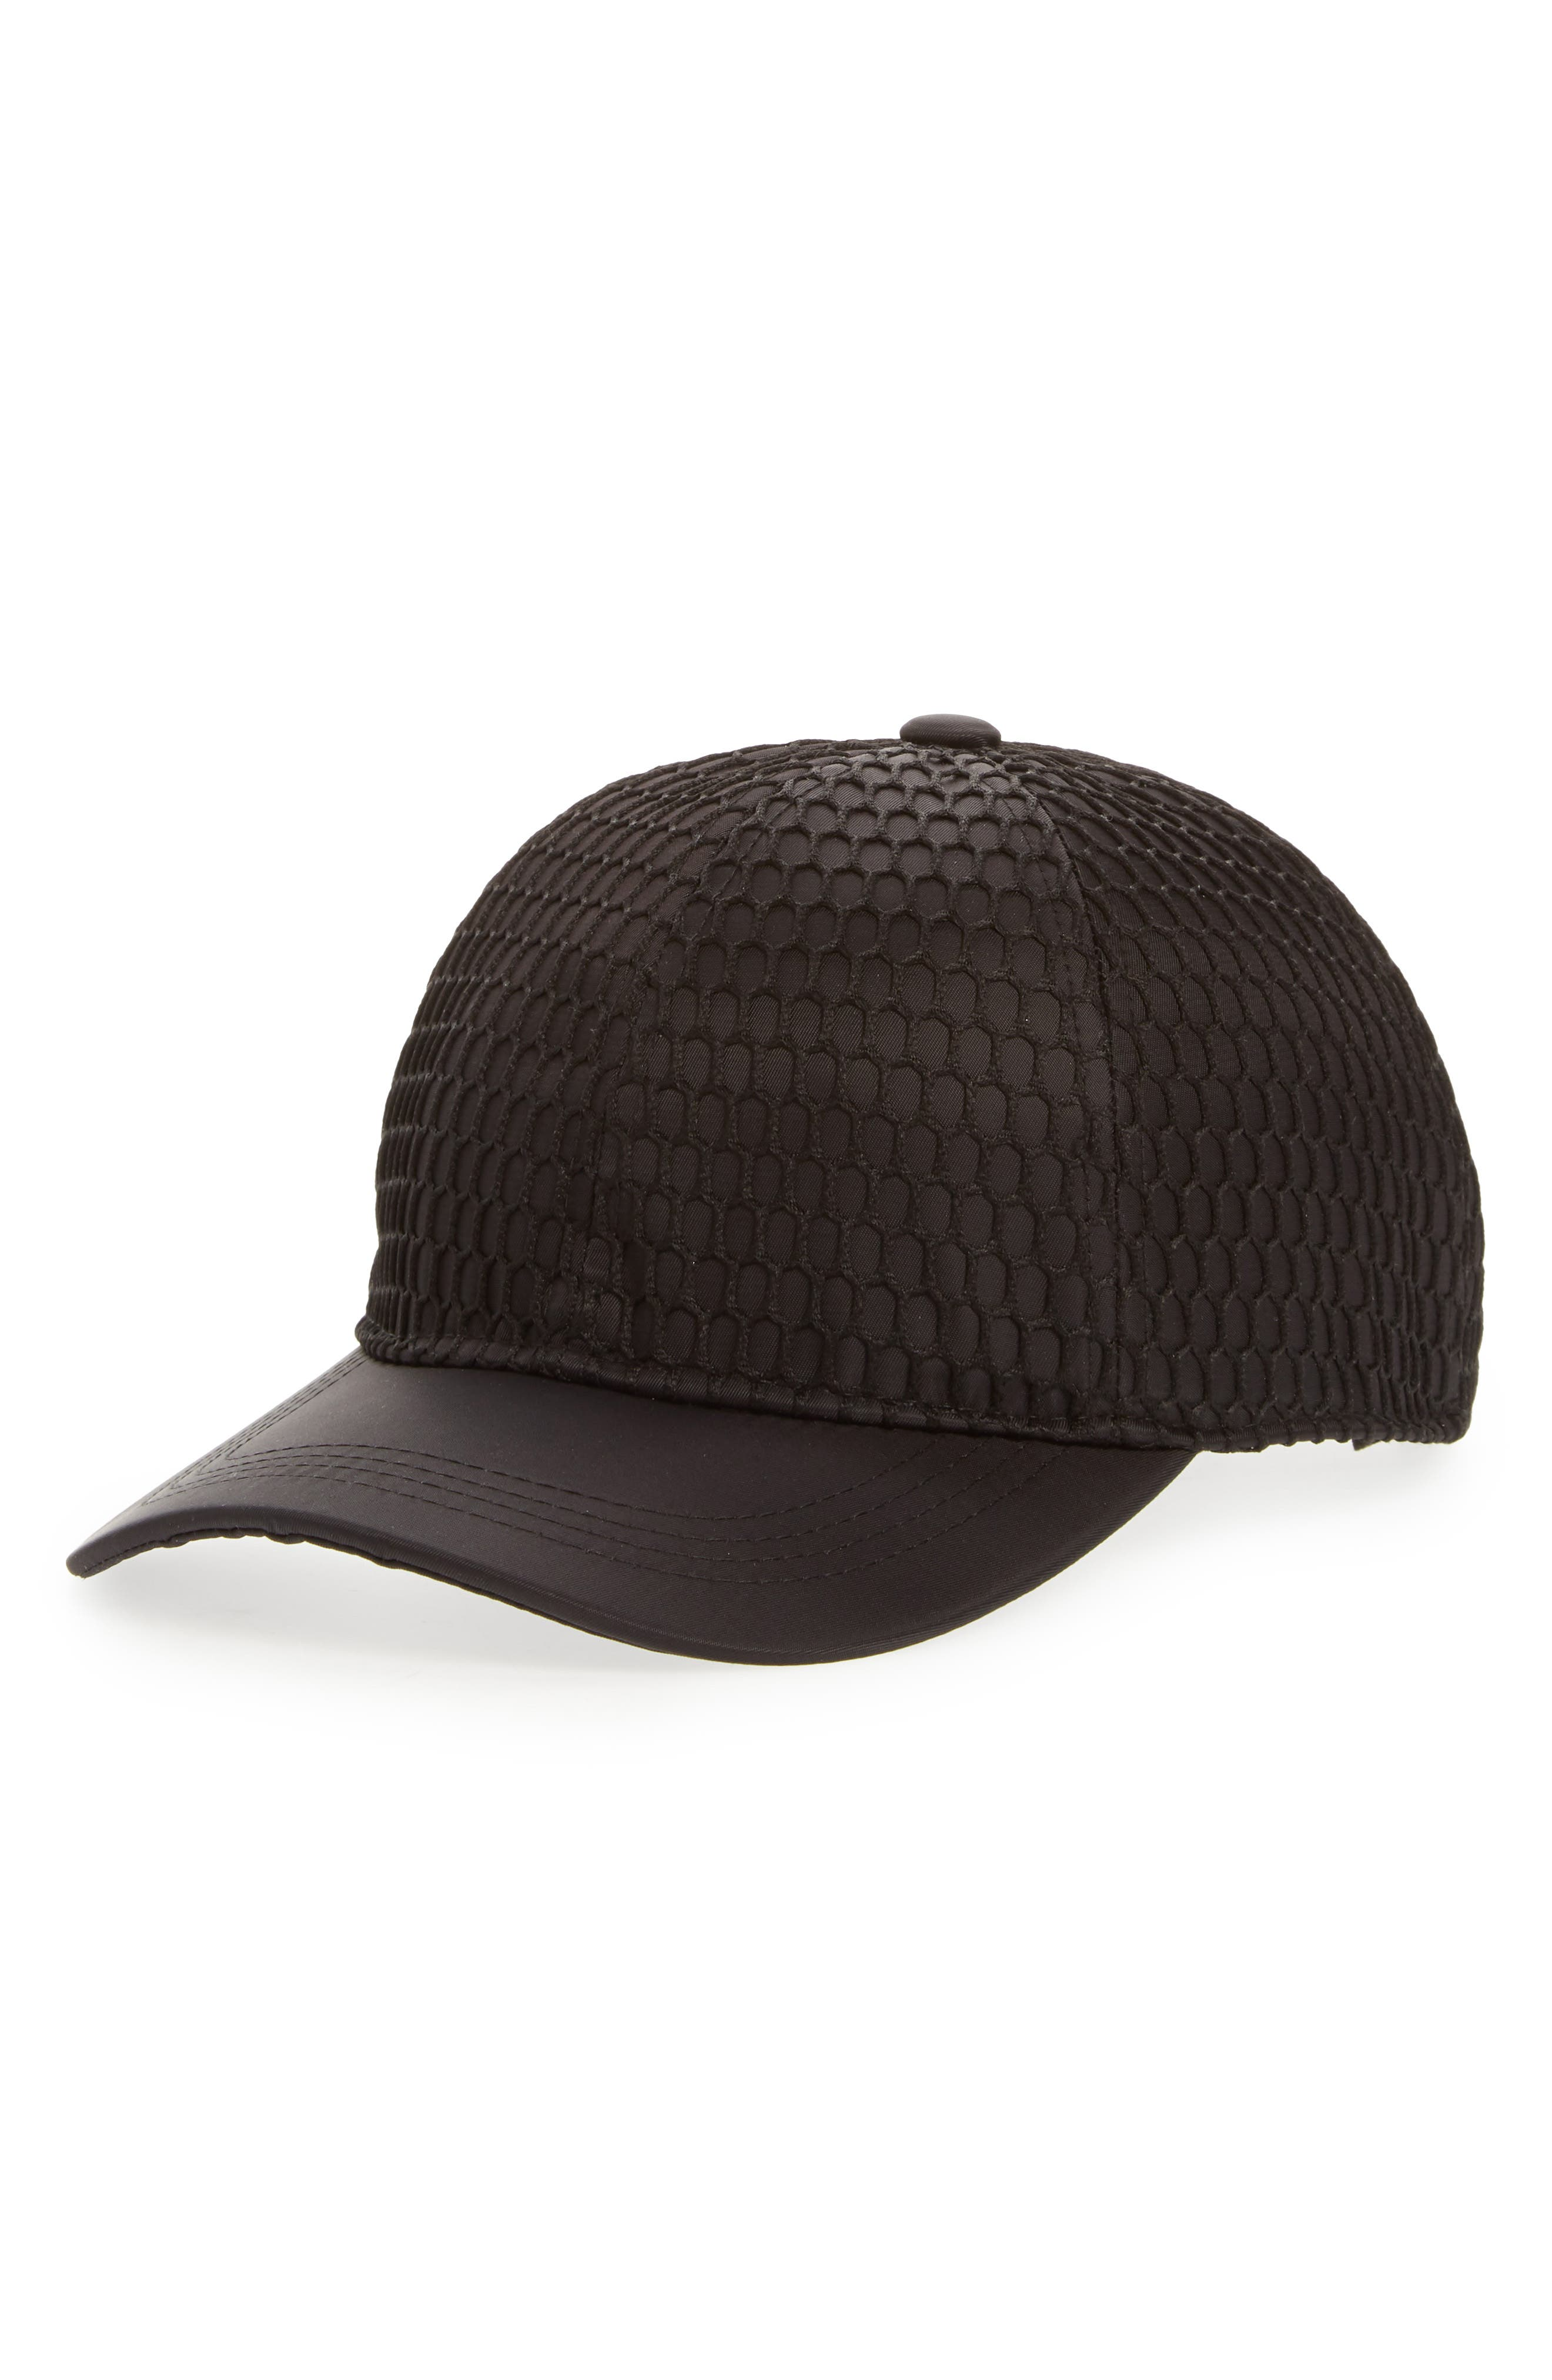 Mesh Crown Baseball Cap,                             Main thumbnail 1, color,                             Black